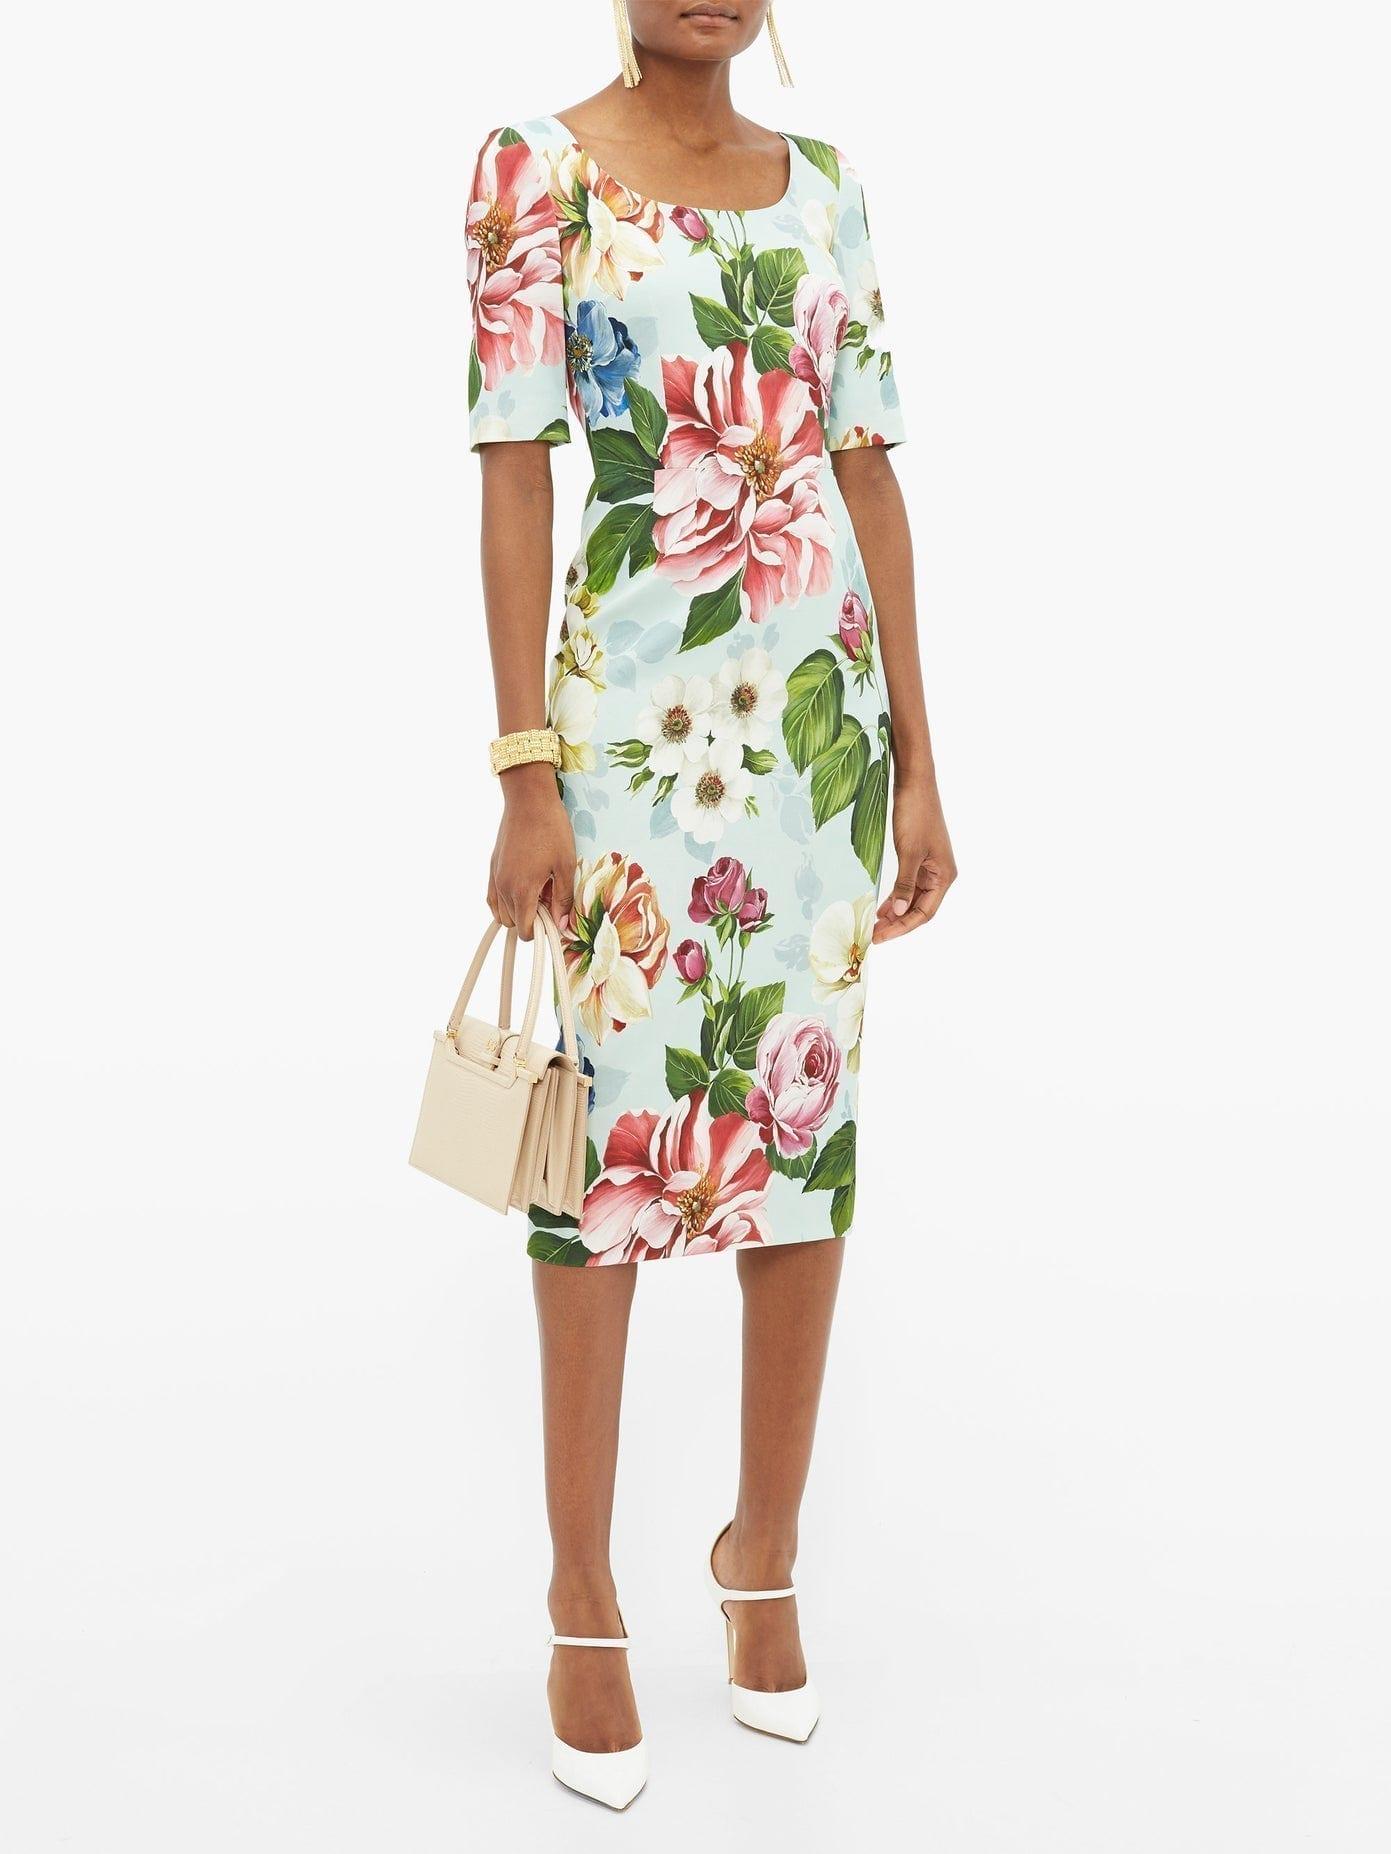 DOLCE & GABBANA Floral-Print Cady Pencil Dress